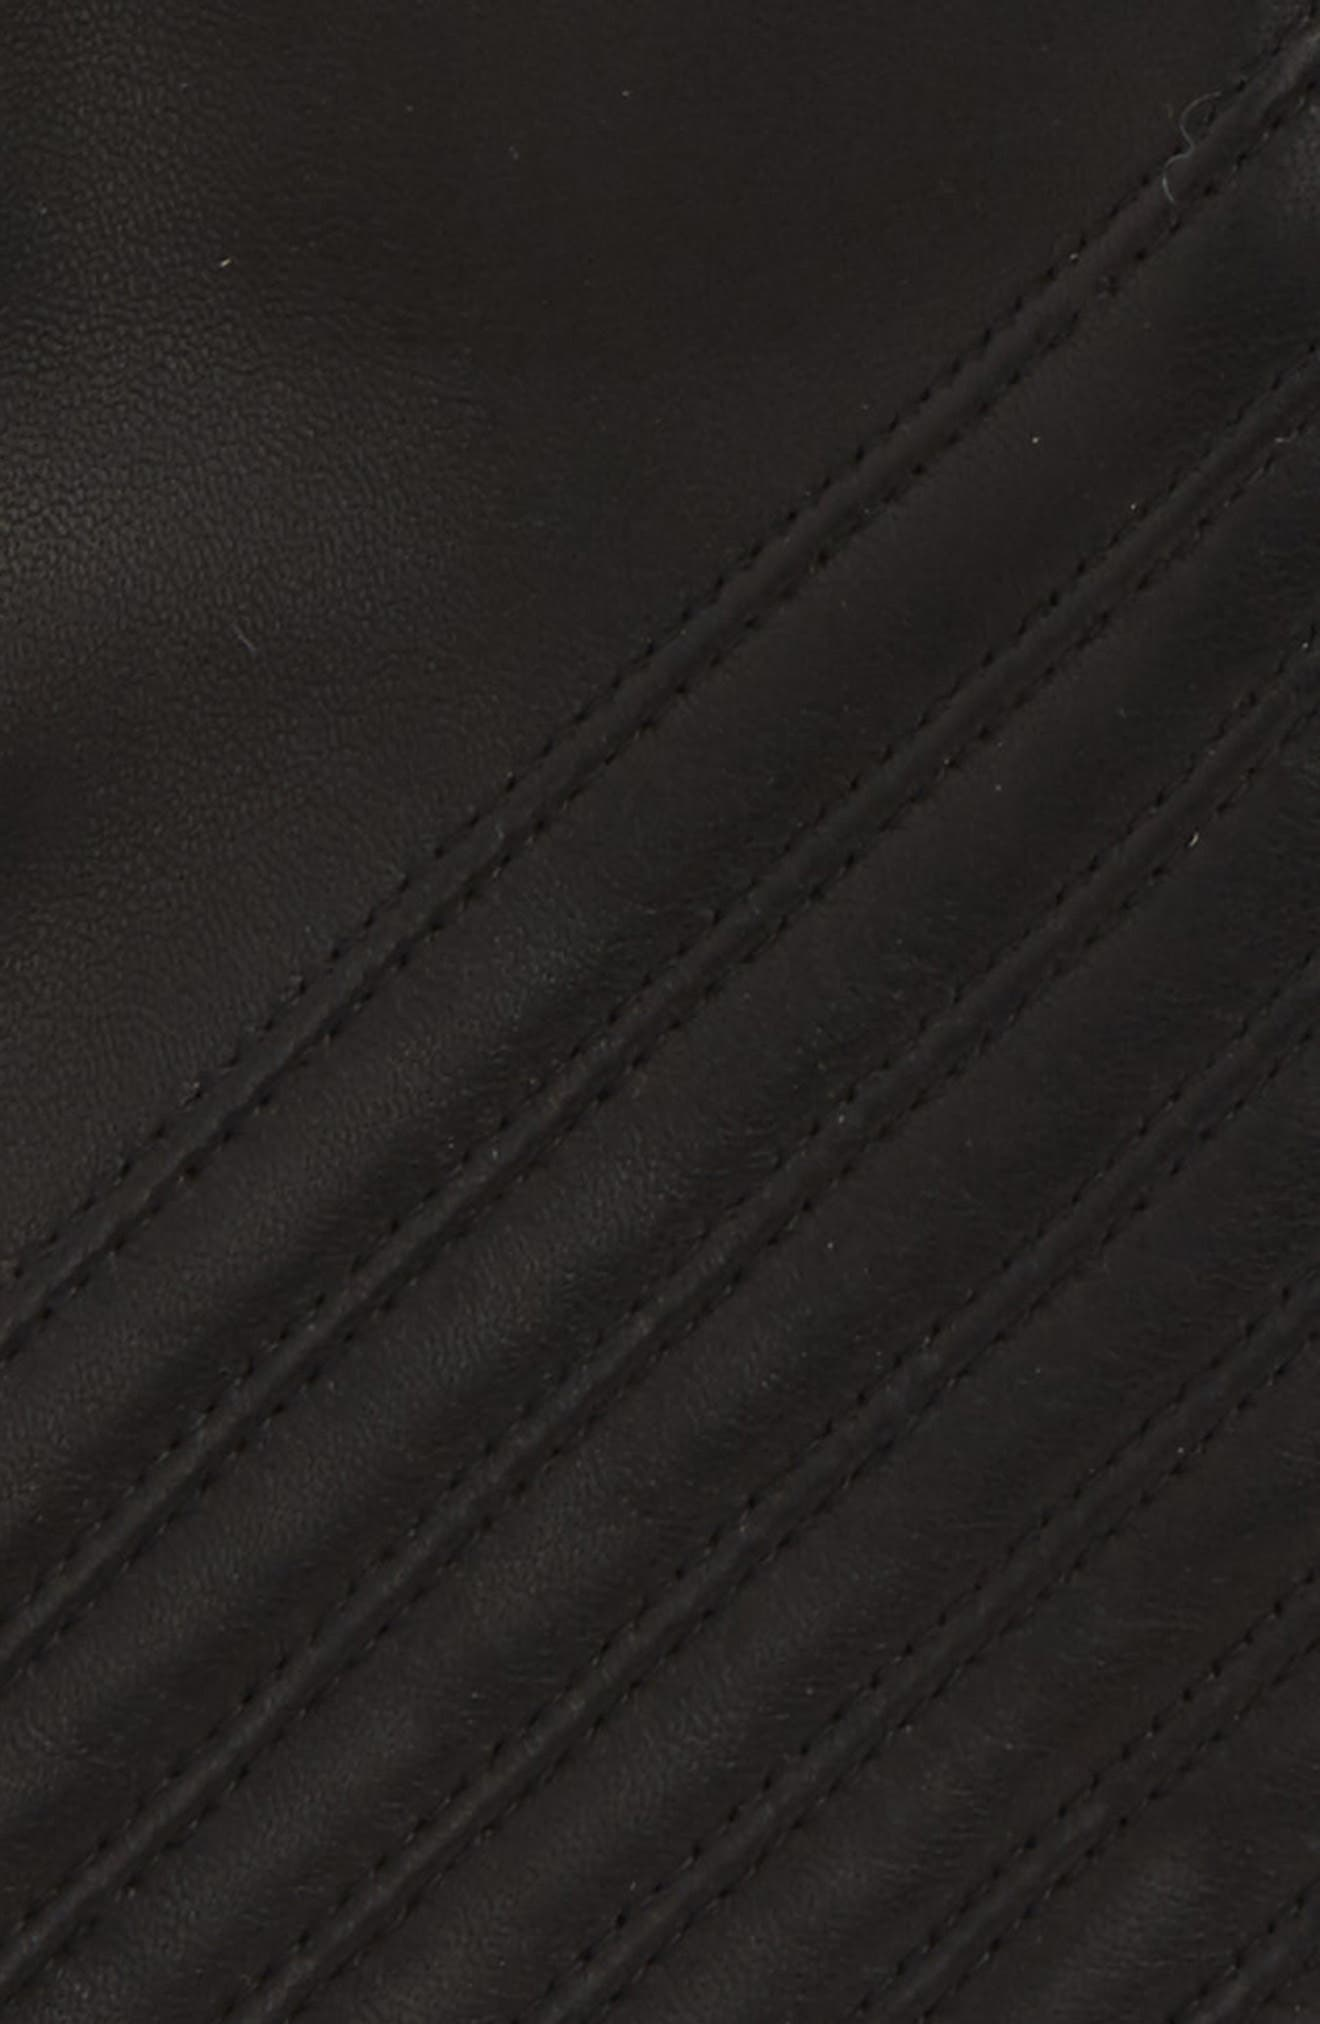 Slant Leather Gloves,                             Alternate thumbnail 2, color,                             Black